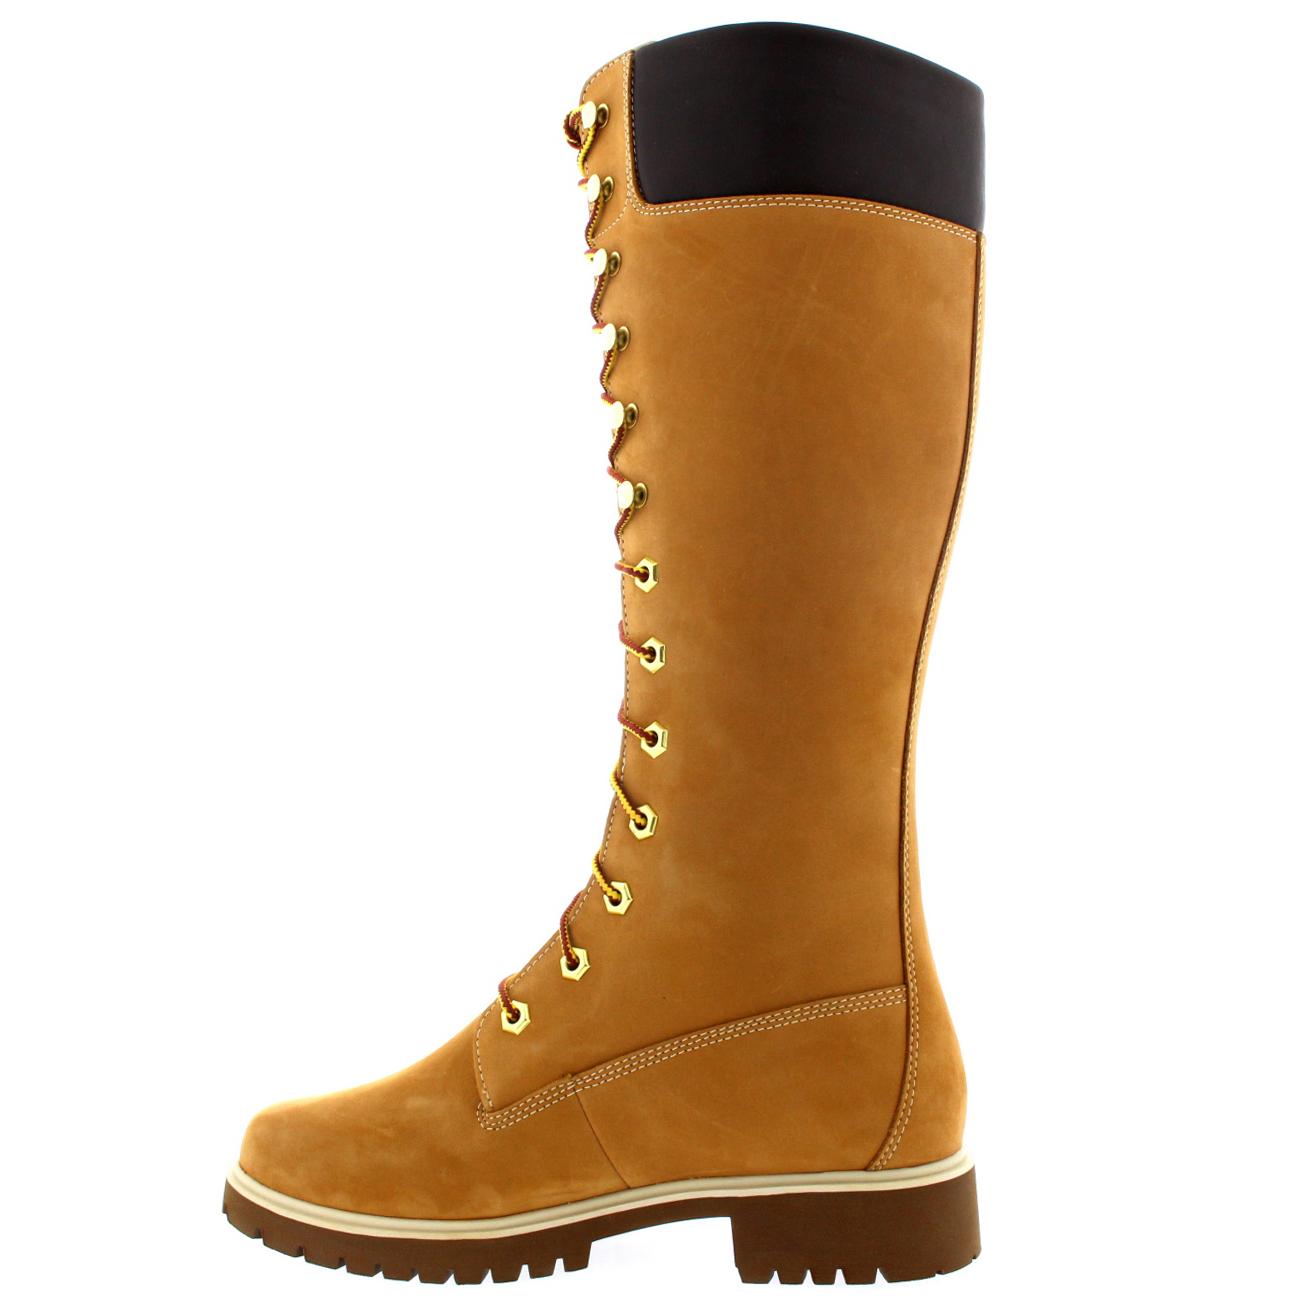 Womens-Timberland-Premium-14-034-Waterproof-Earth-Keeper-Knee-High-Boots-UK-3-9